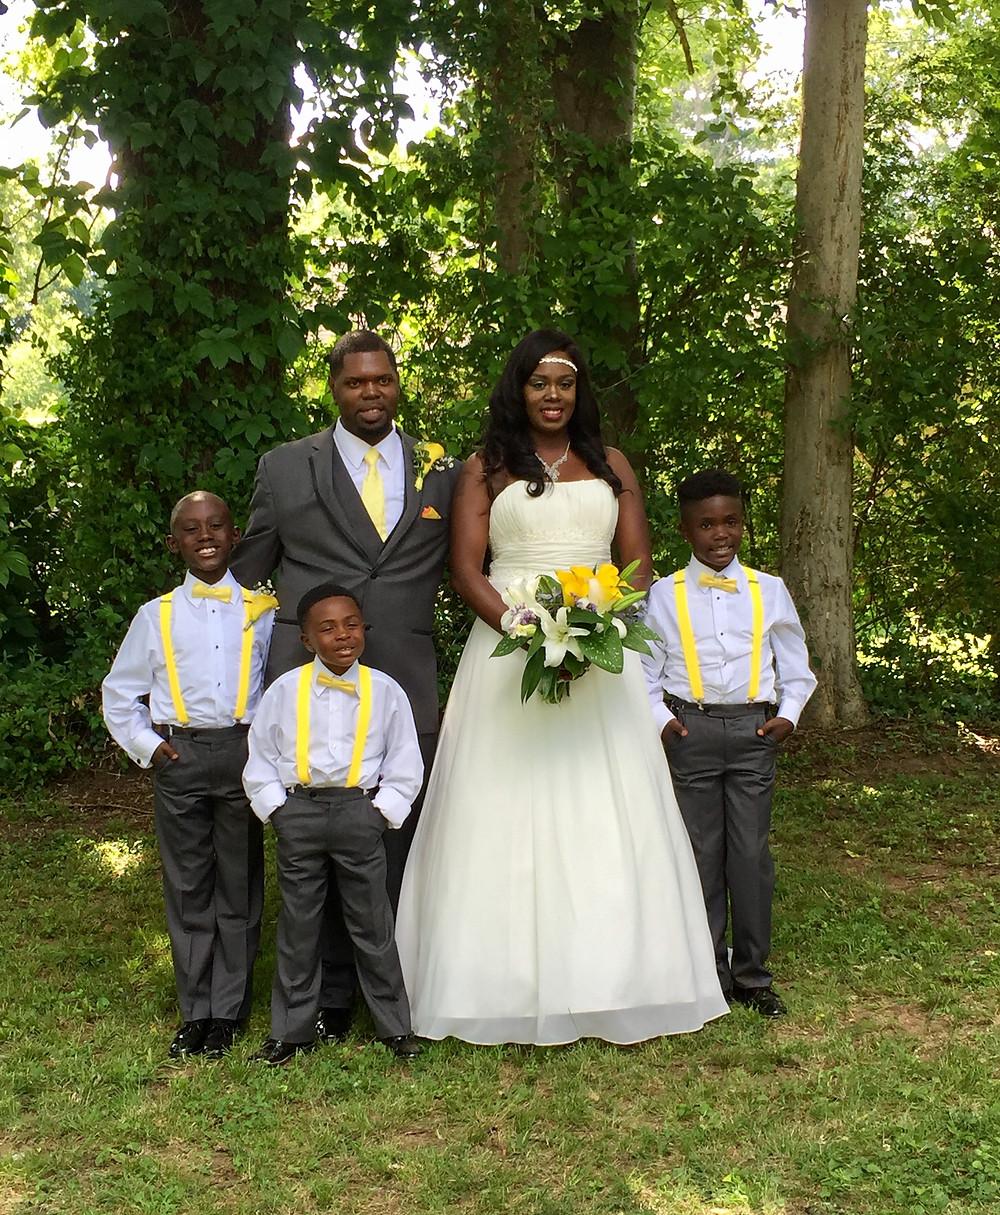 Woodland Wedding - Nashville, TN